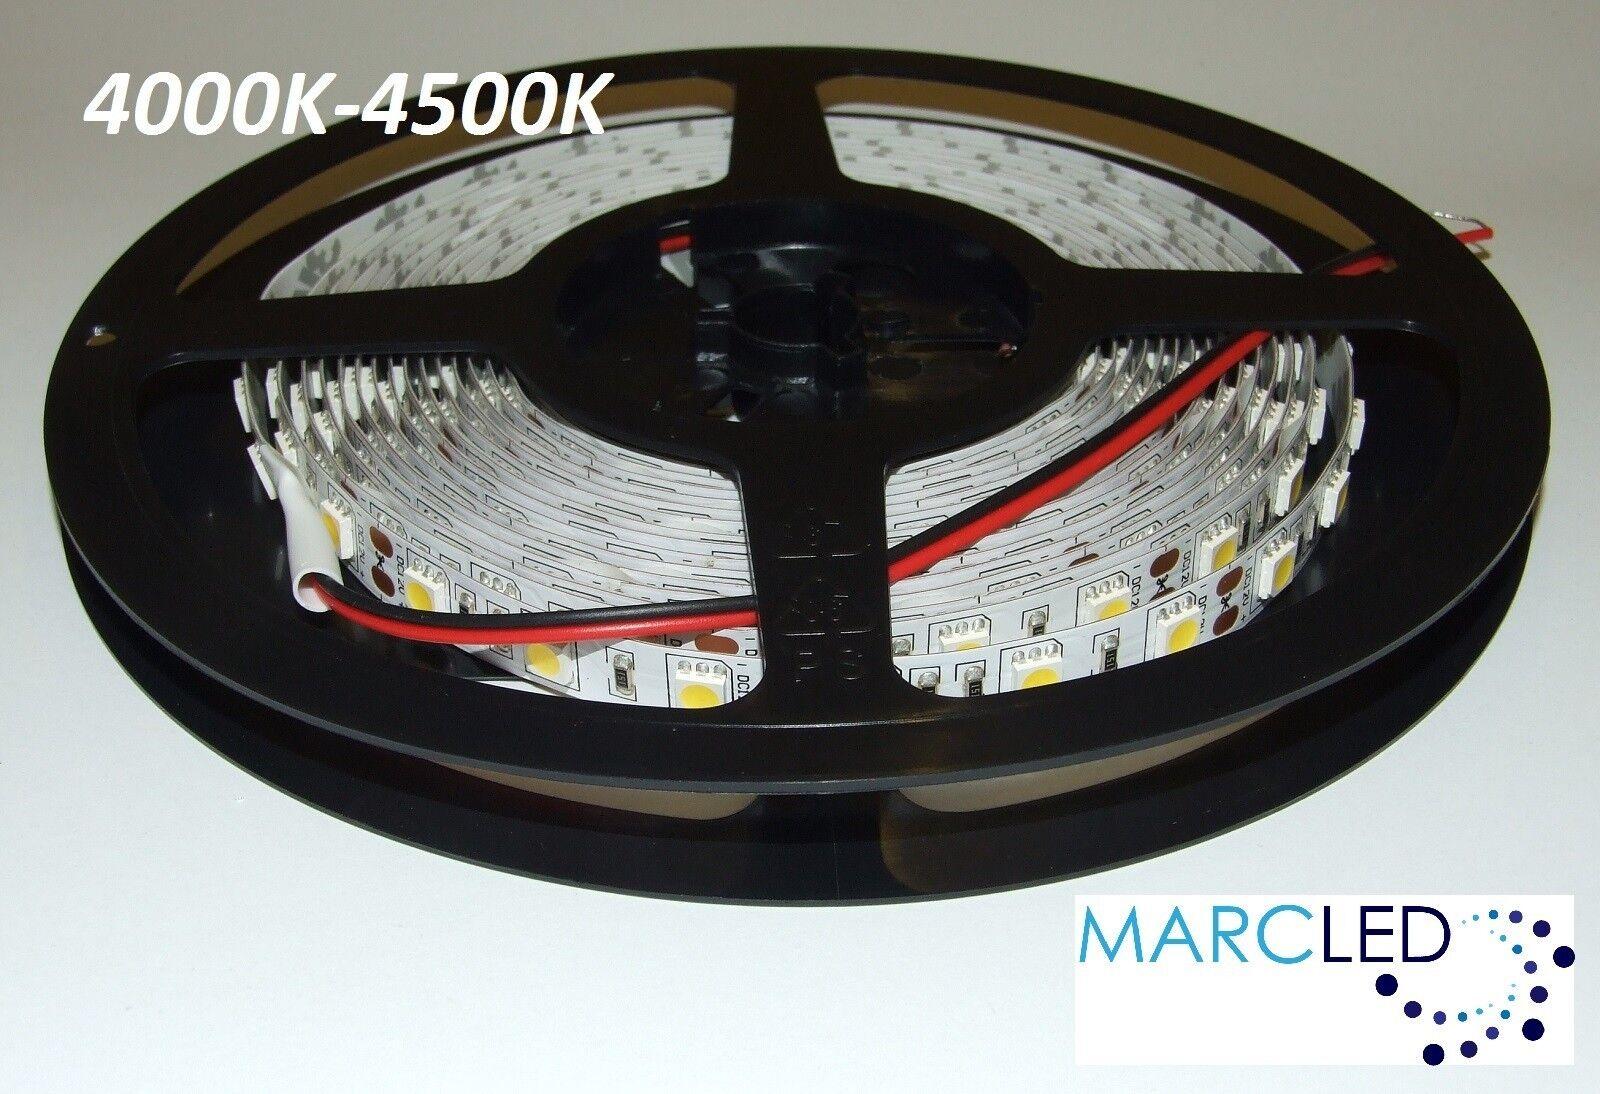 12VDC SMD5050 LED strip 4000K-4500K, 5m (72W, 300LEDs), IP20, 60LEDs m, 14.4W m